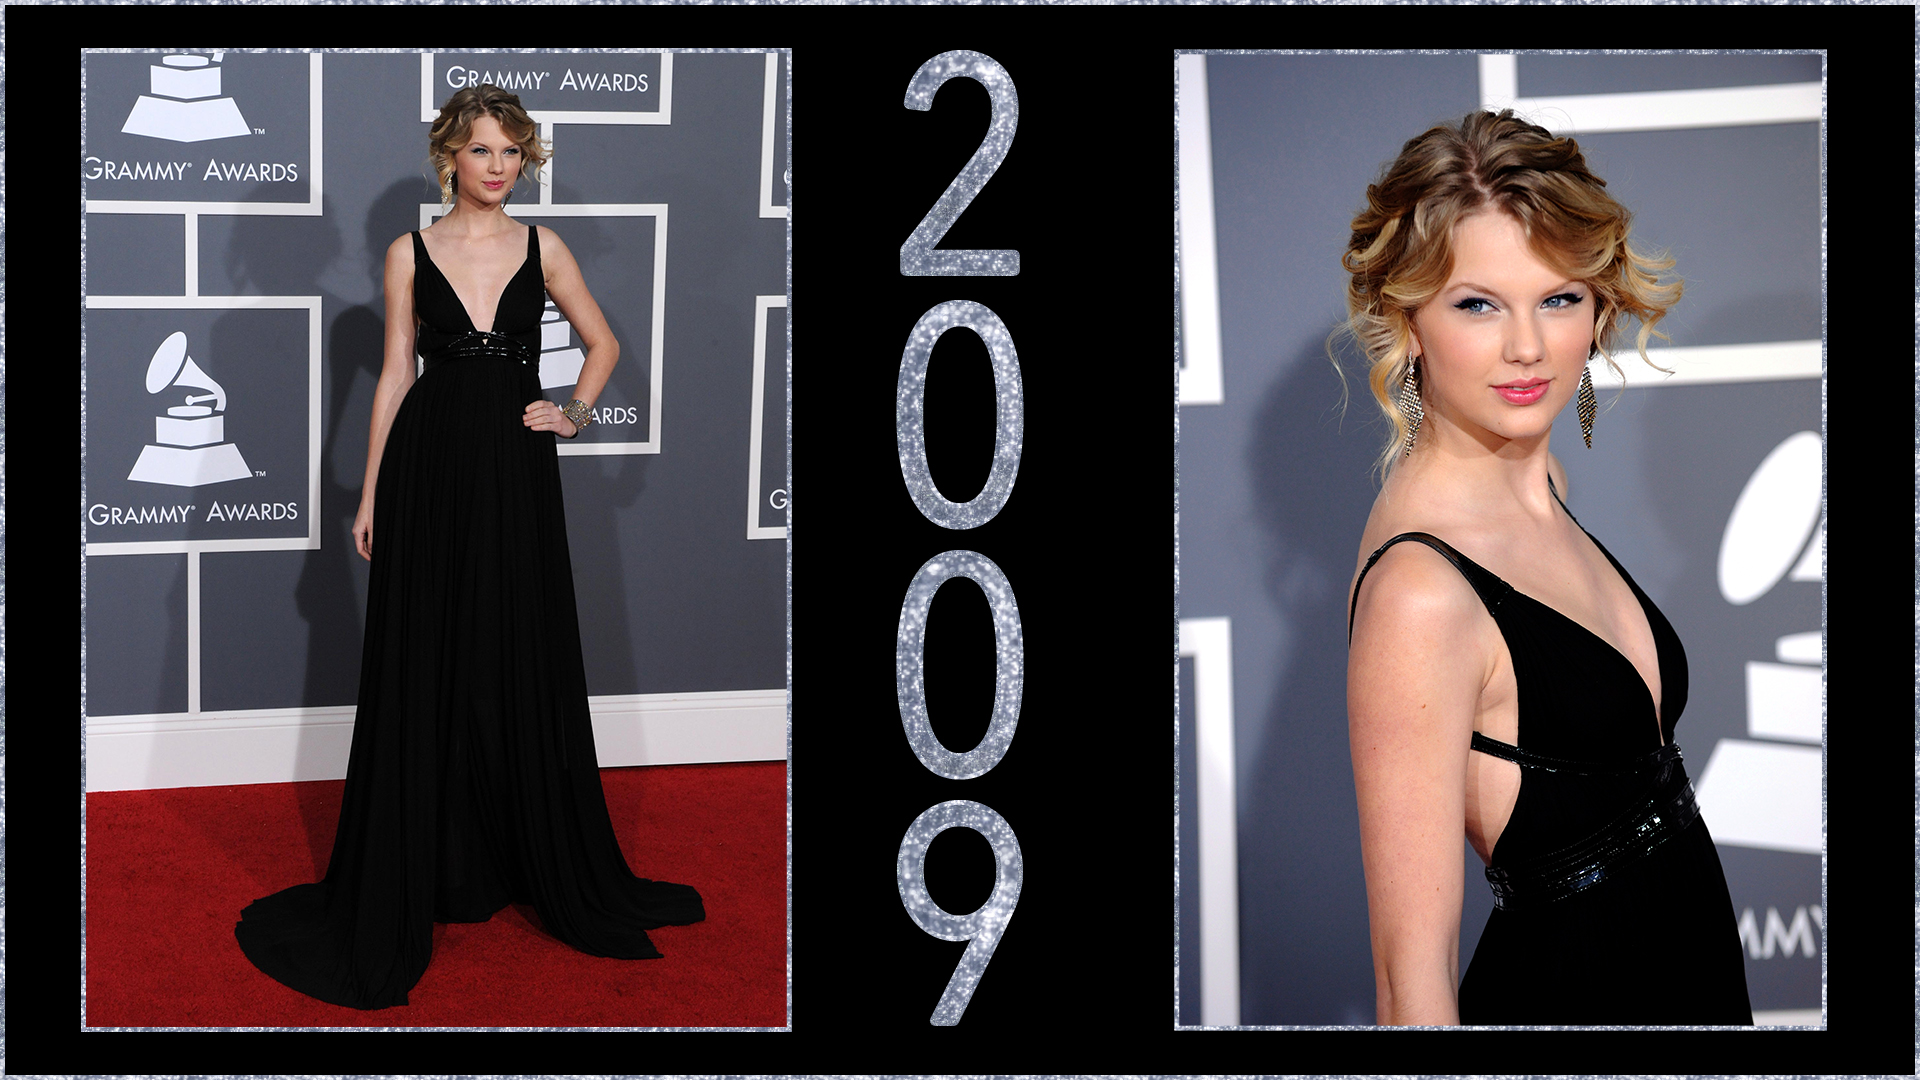 2009: Black dresses are